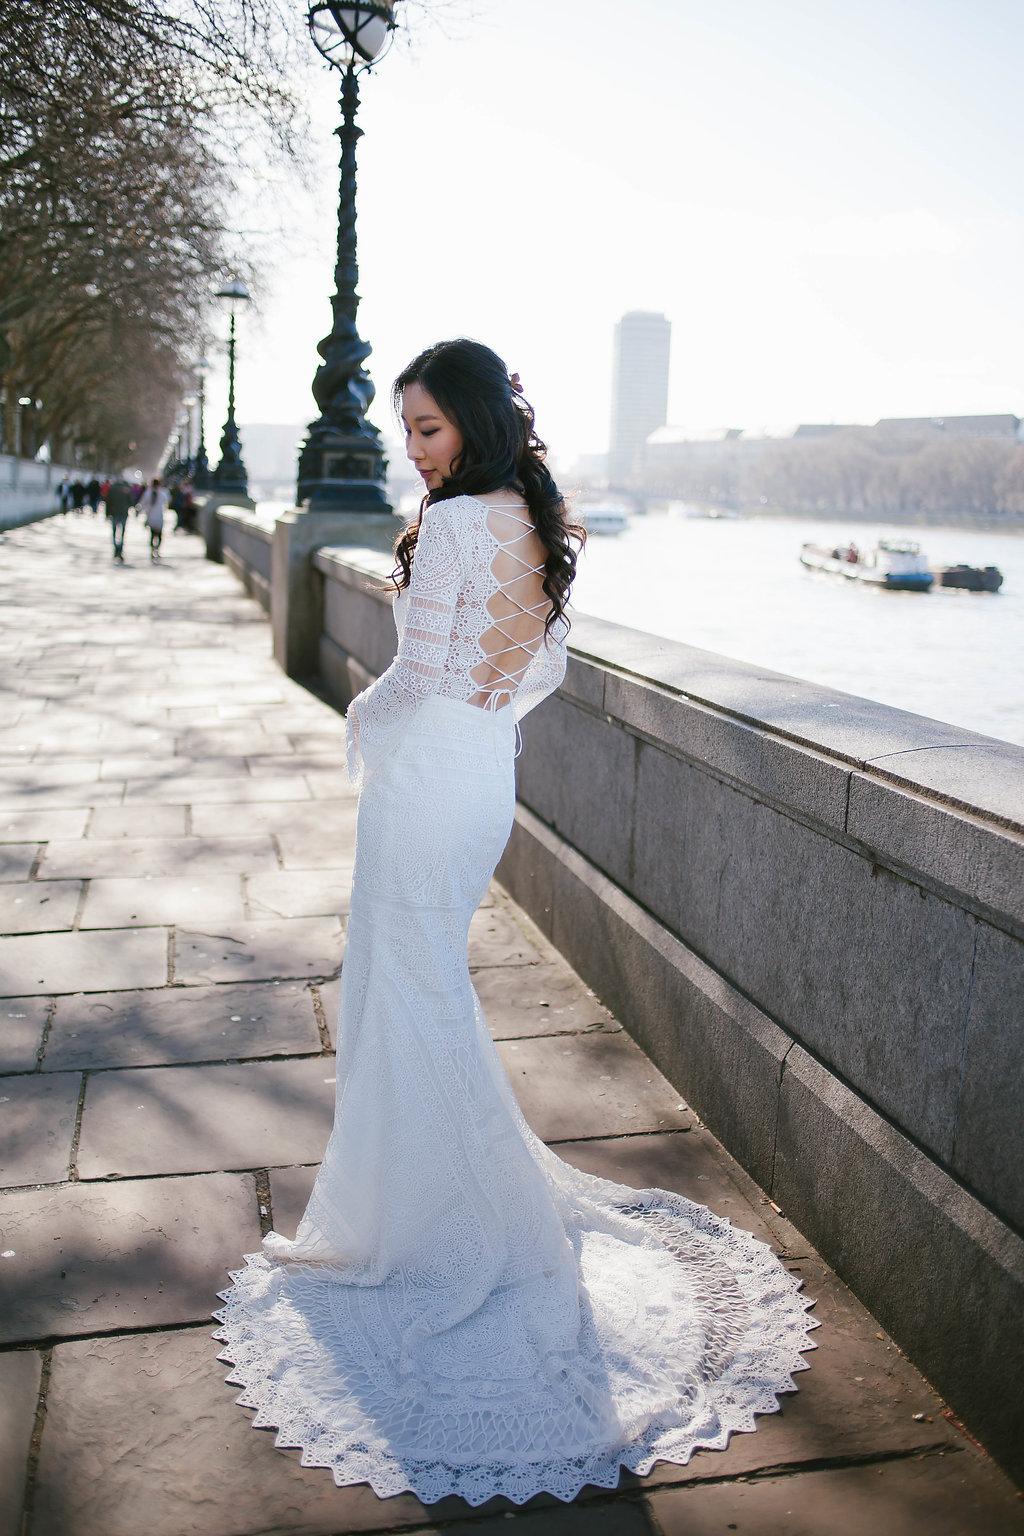 Nina Pang Photography - City Bride - London wedding - City wedding - Chinese wedding 30